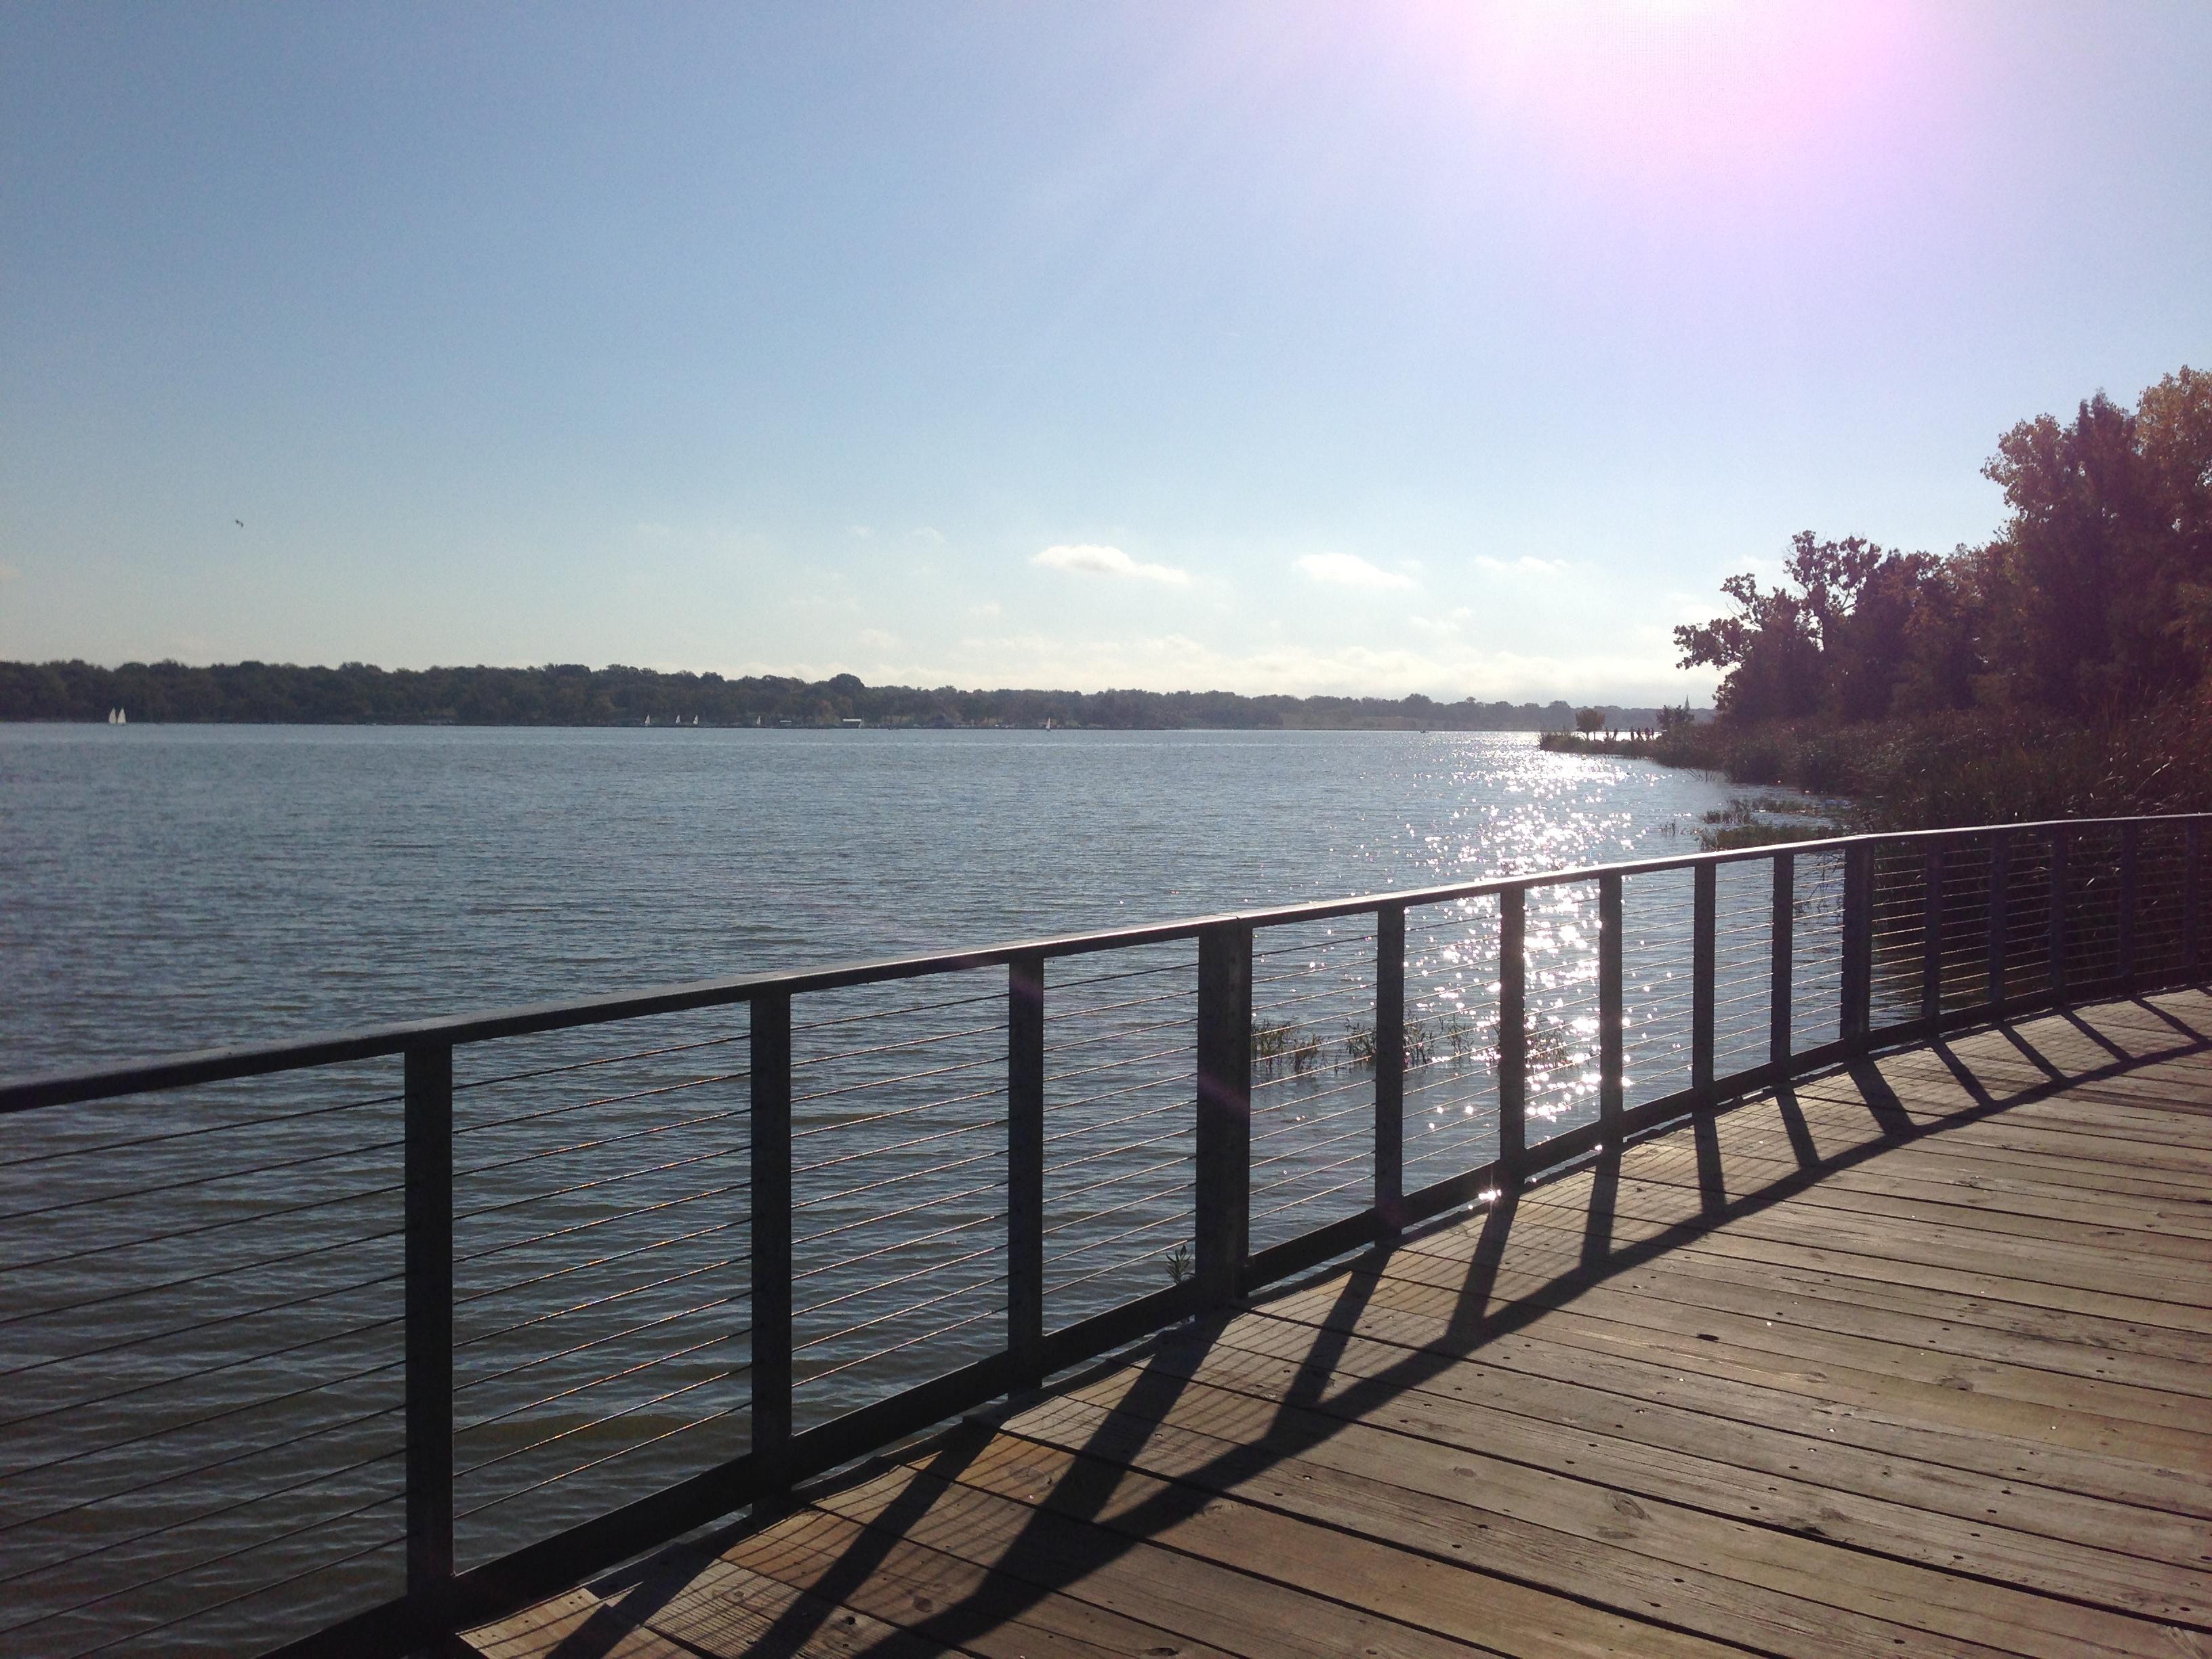 Swingers in lake dallas texas Swingers events in Lake Dallas - Meetup